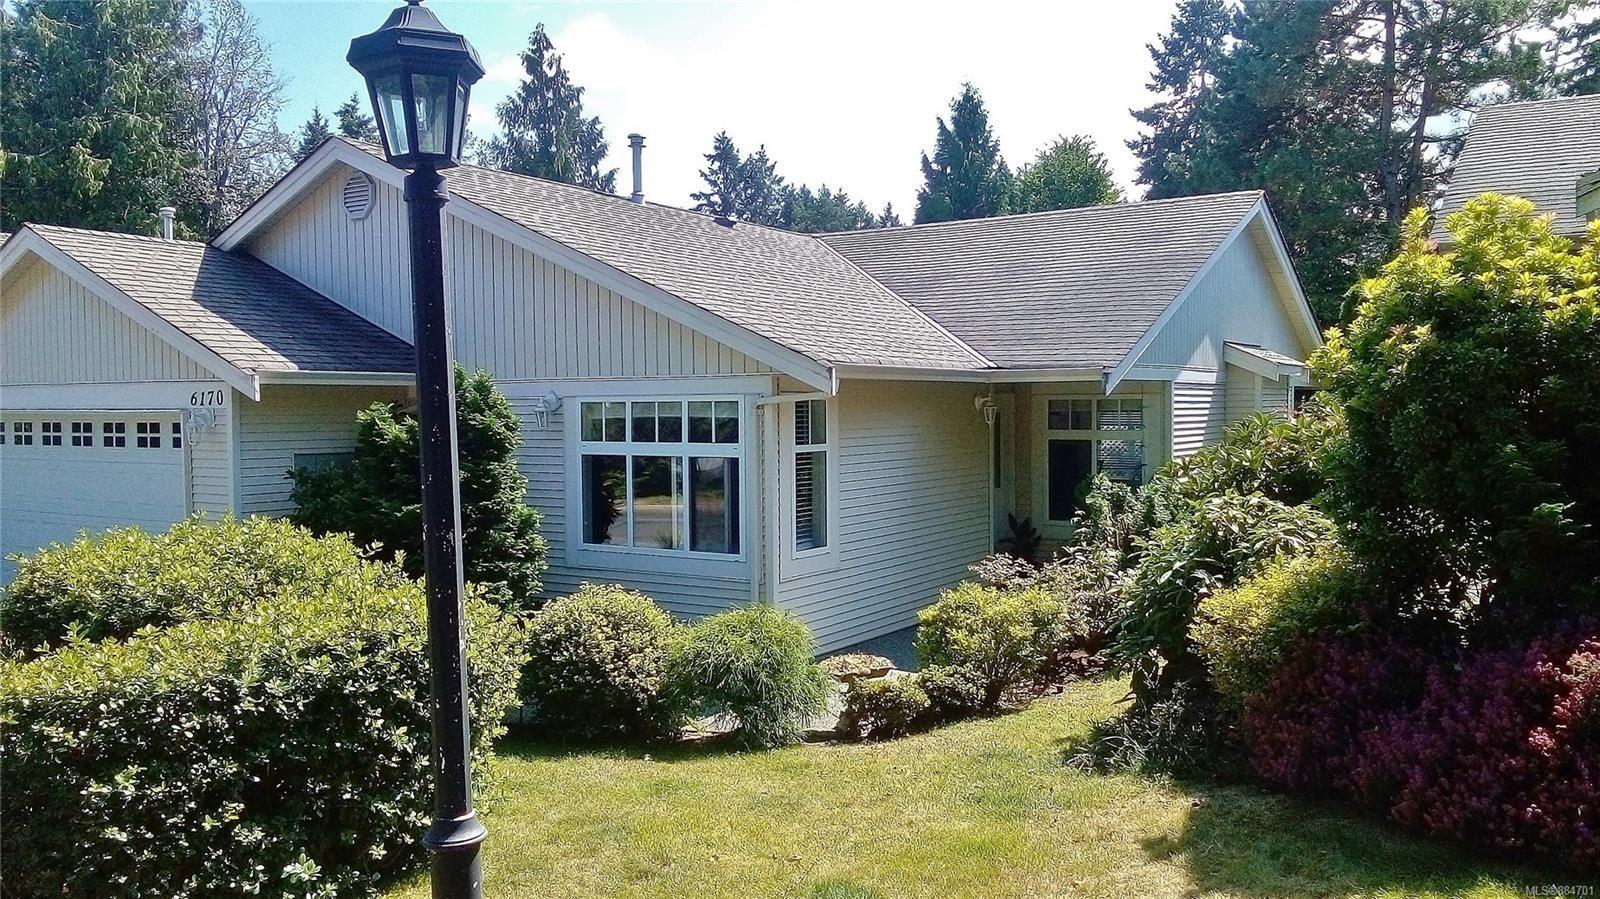 Main Photo: 6170 Delray Pl in : Na North Nanaimo Row/Townhouse for sale (Nanaimo)  : MLS®# 884701